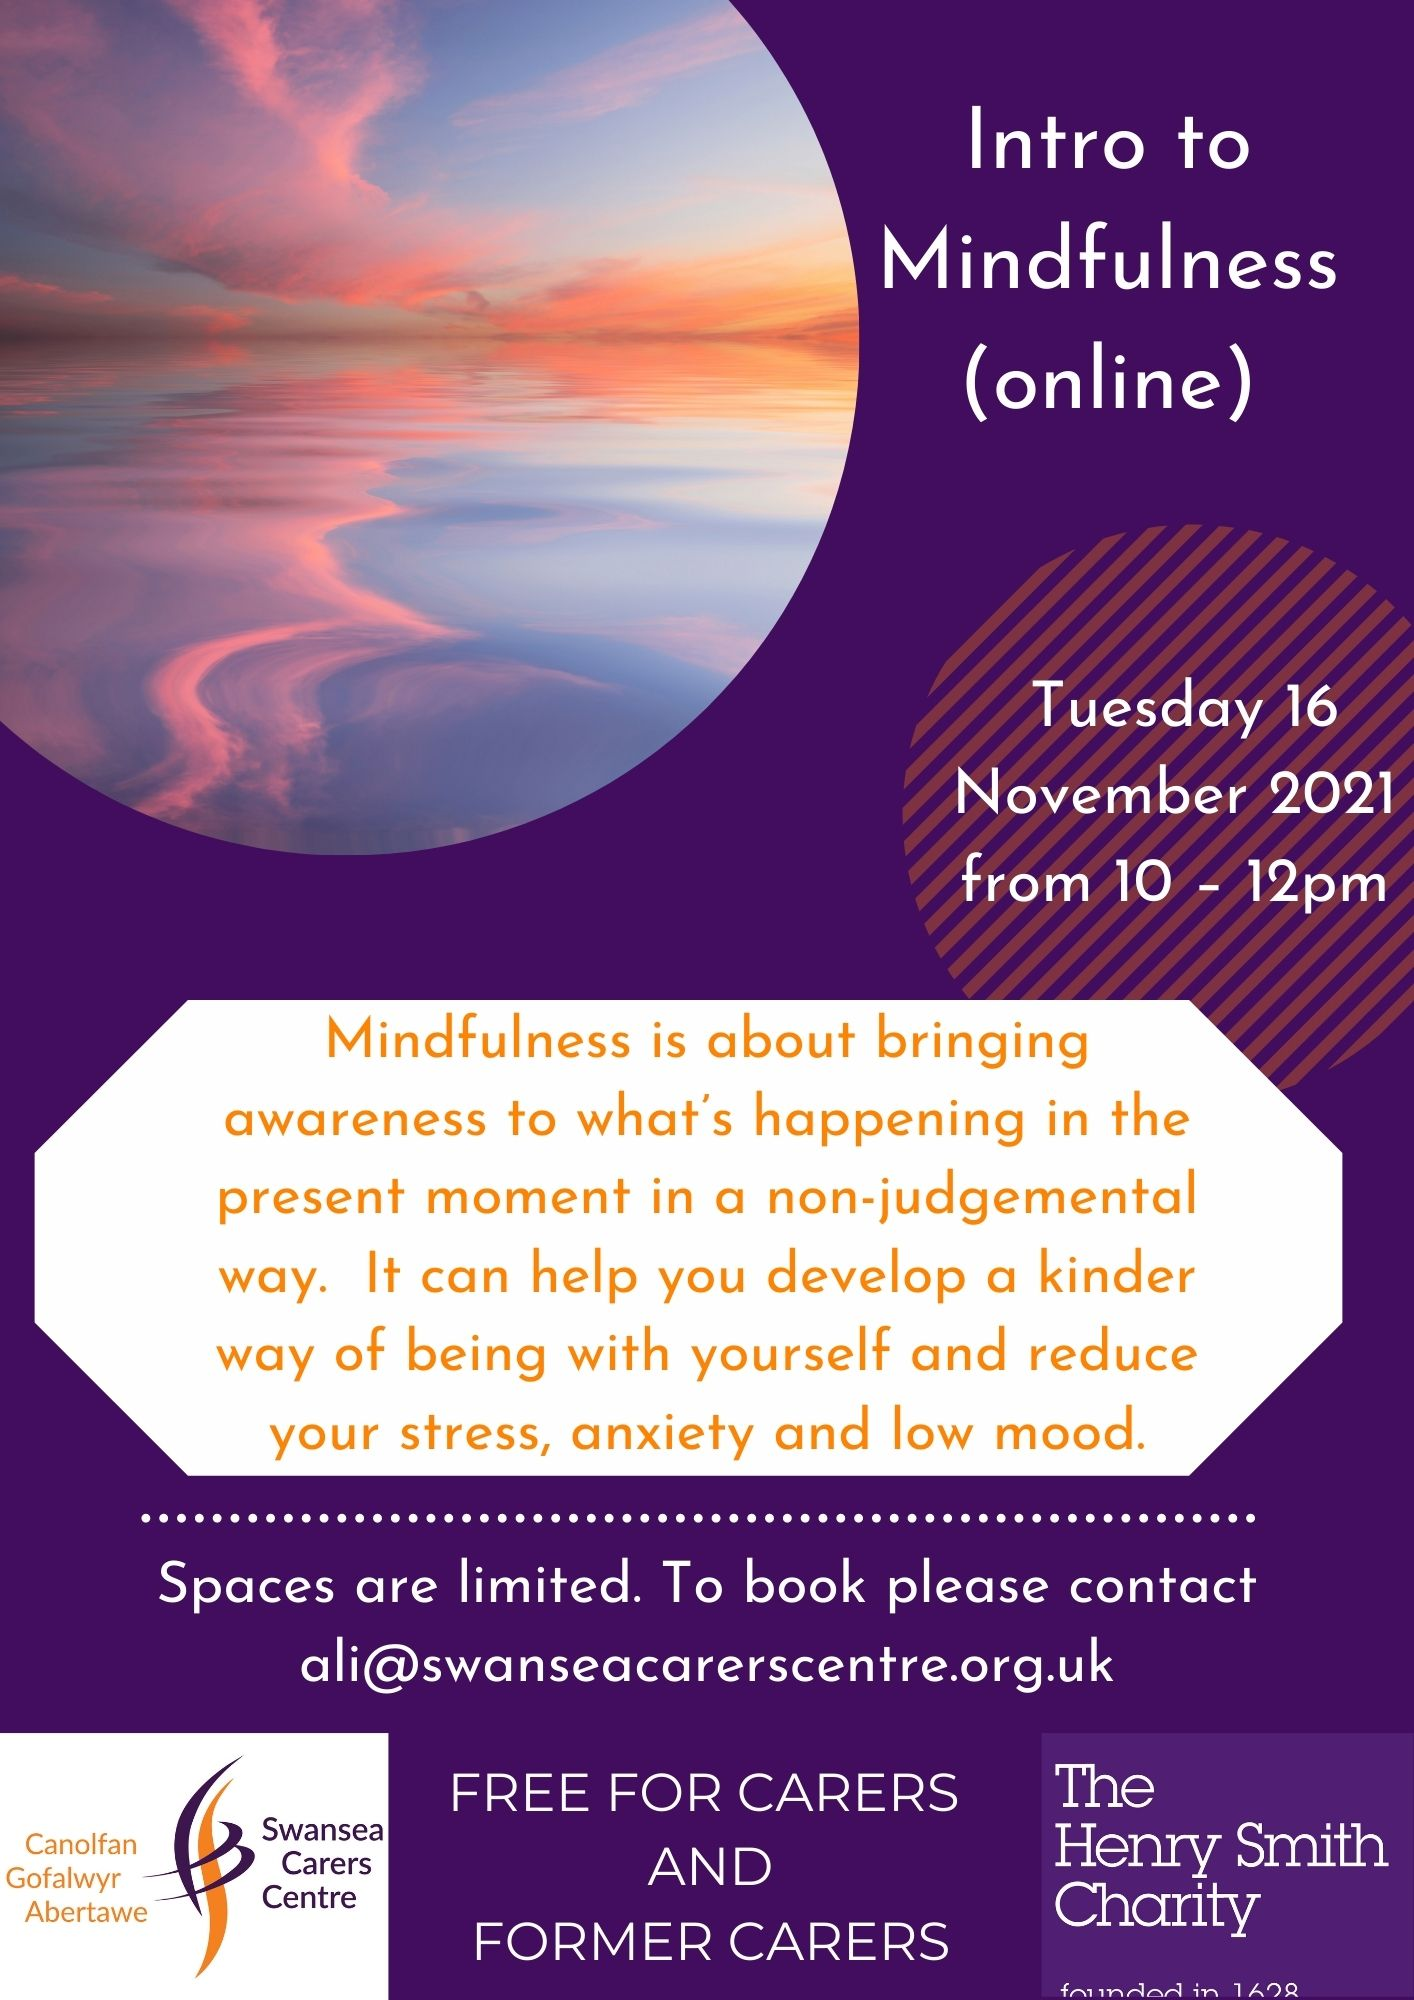 Intro To Mindfulness